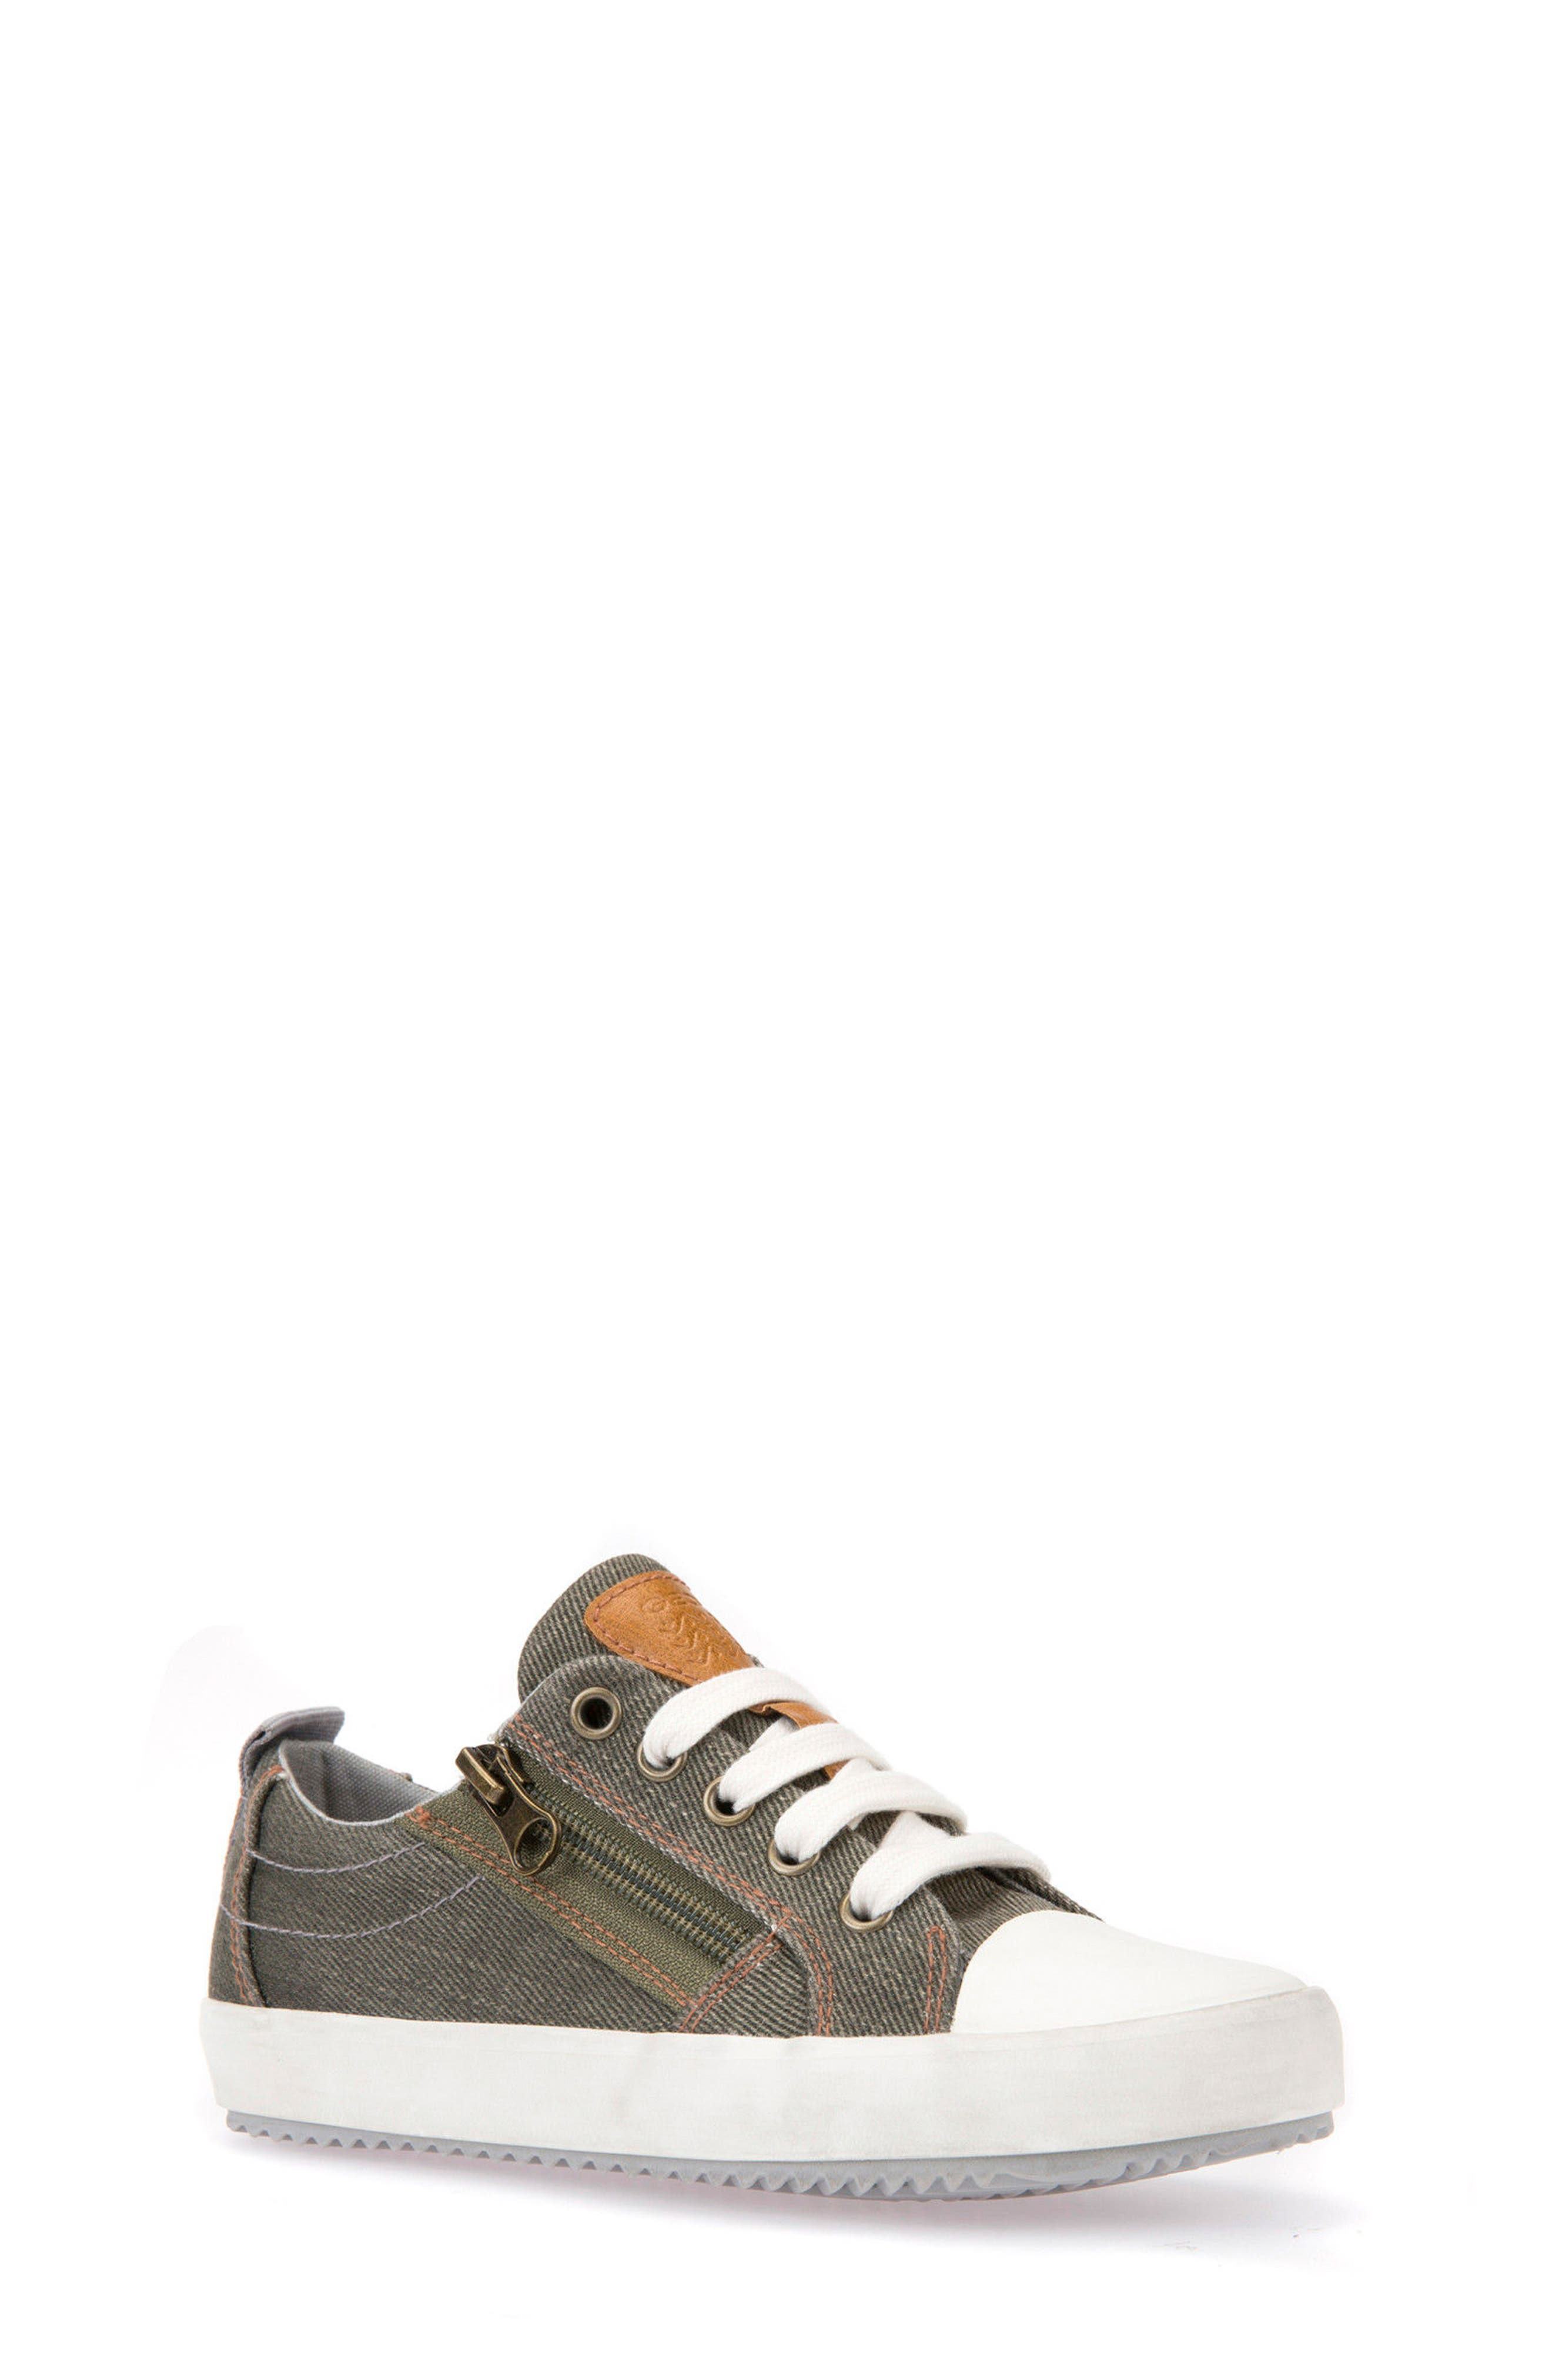 Alternate Image 1 Selected - Geox Alonisso Low Top Sneaker (Toddler, Little Kid & Big Kid)